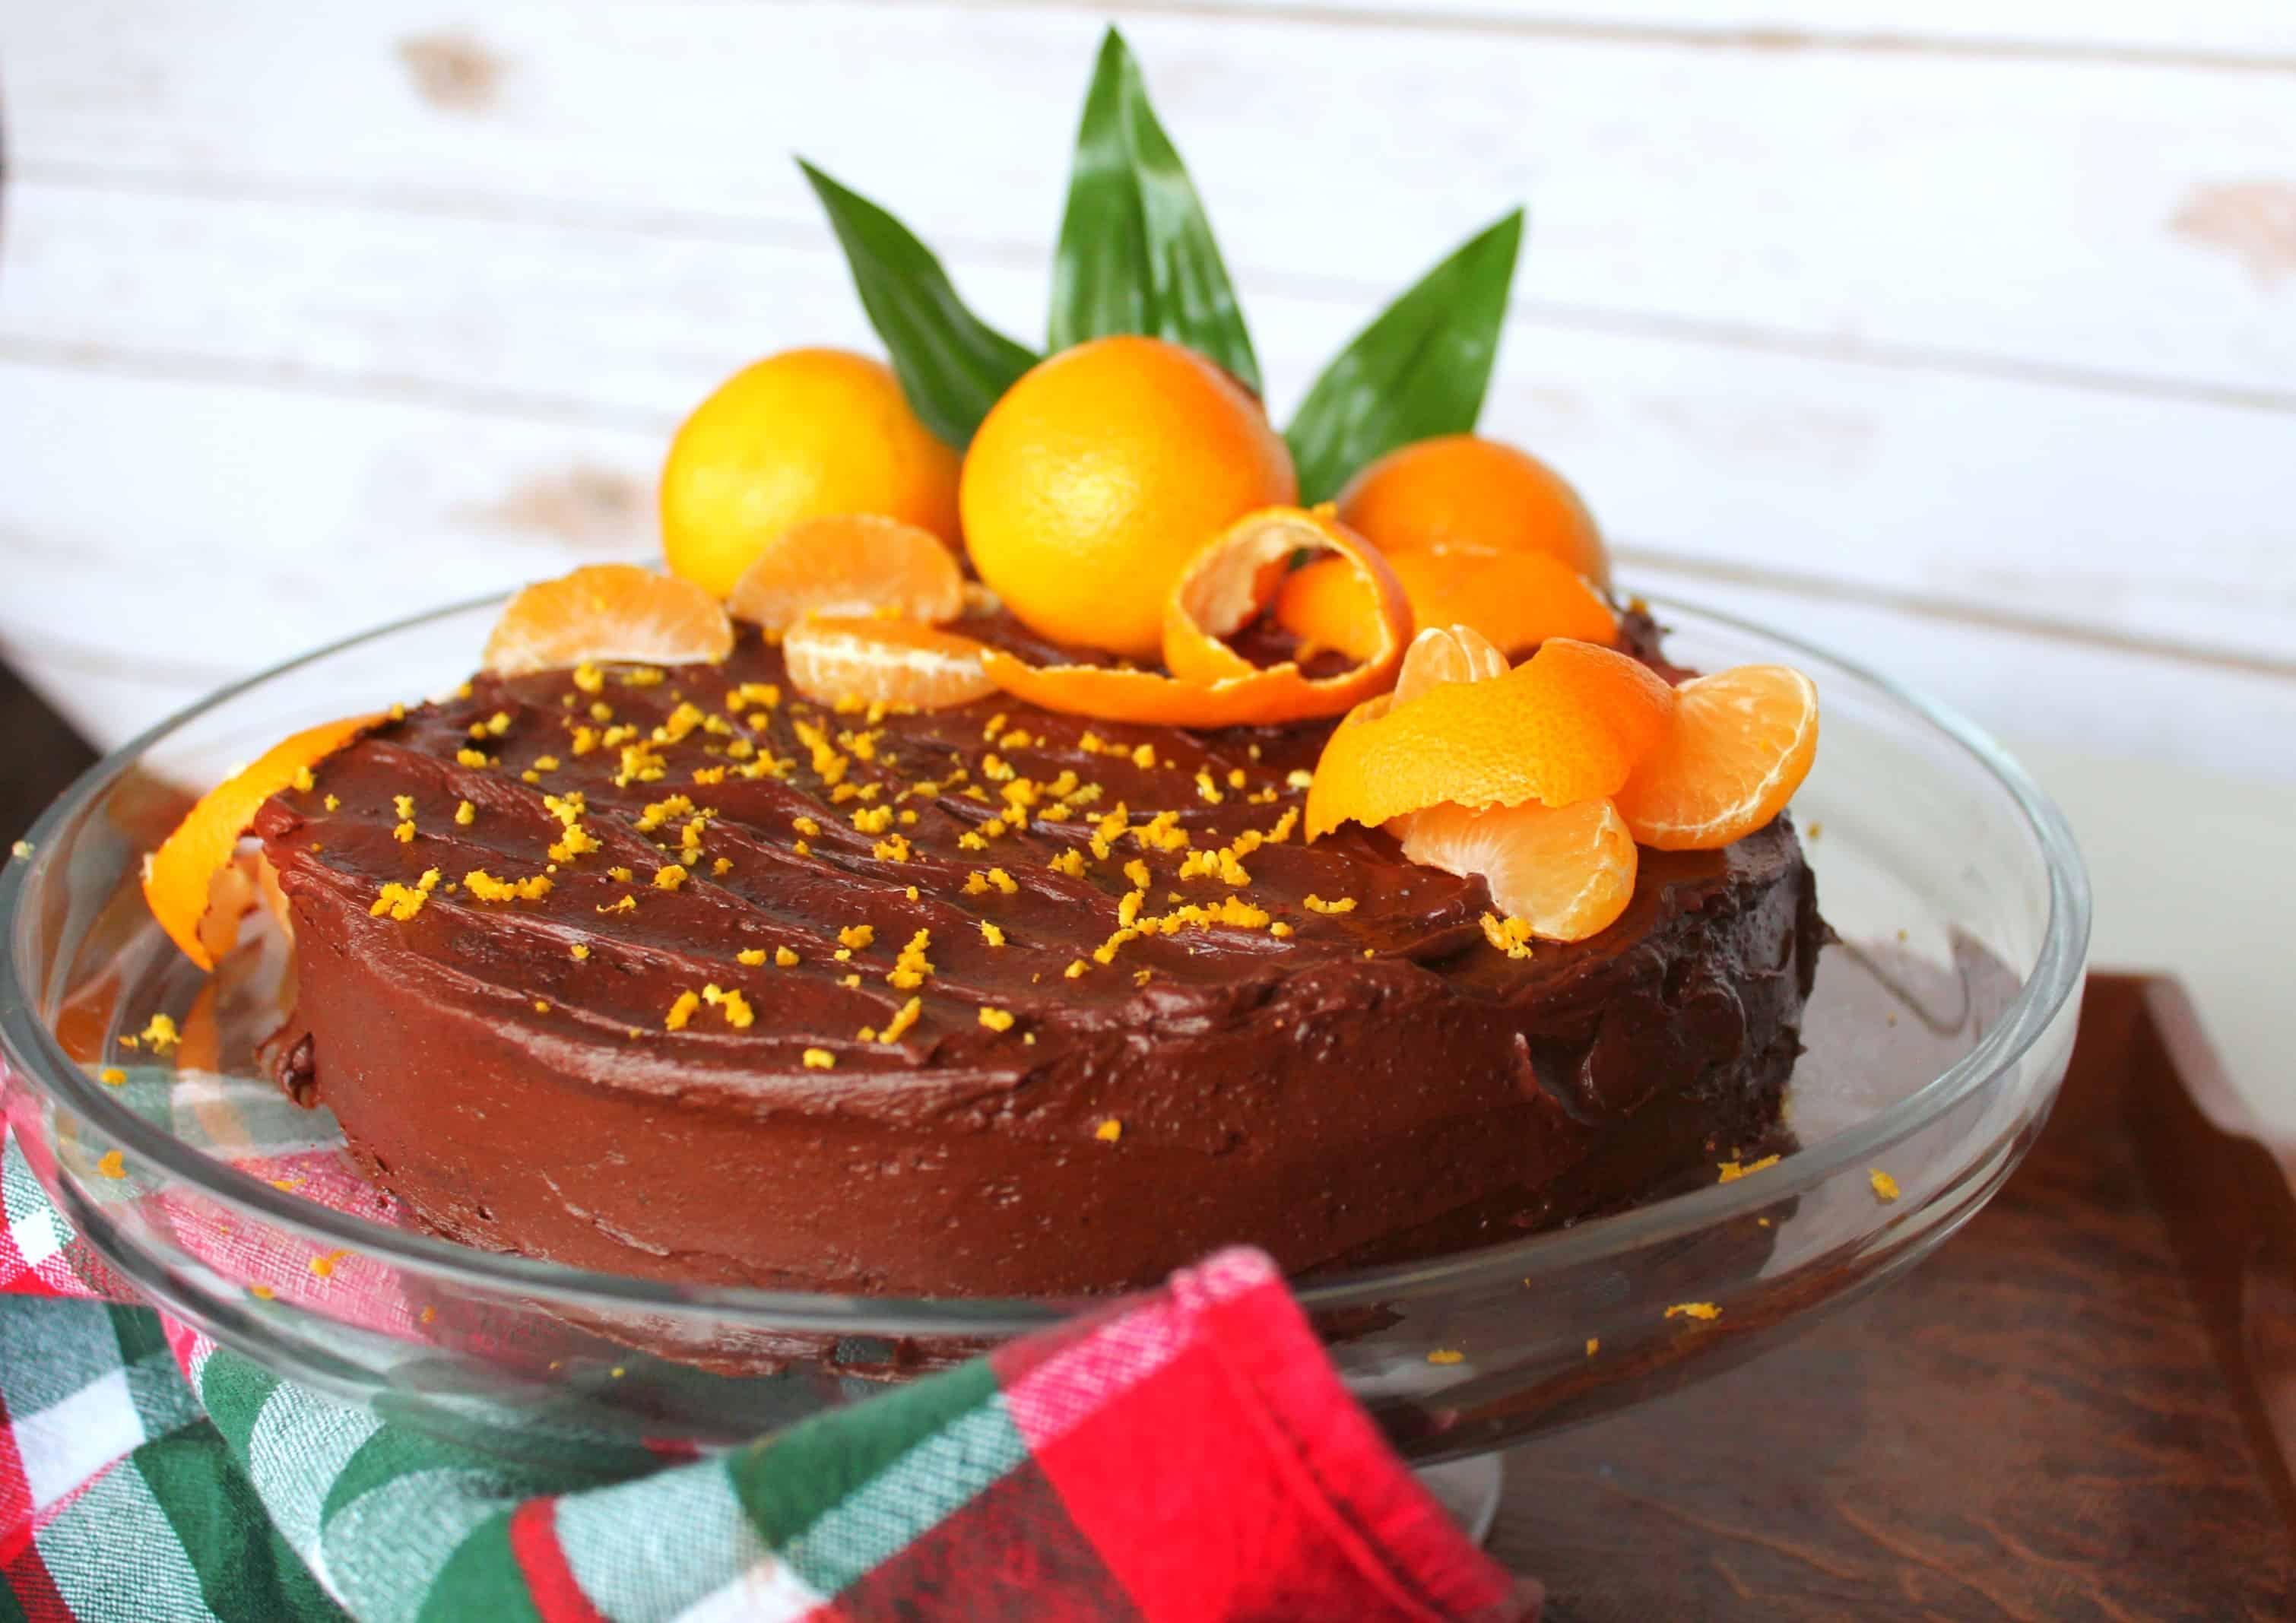 Vanilla Cake with Chocolate Espresso Frosting, Gluten Free, Paleo, keto, keto dessert